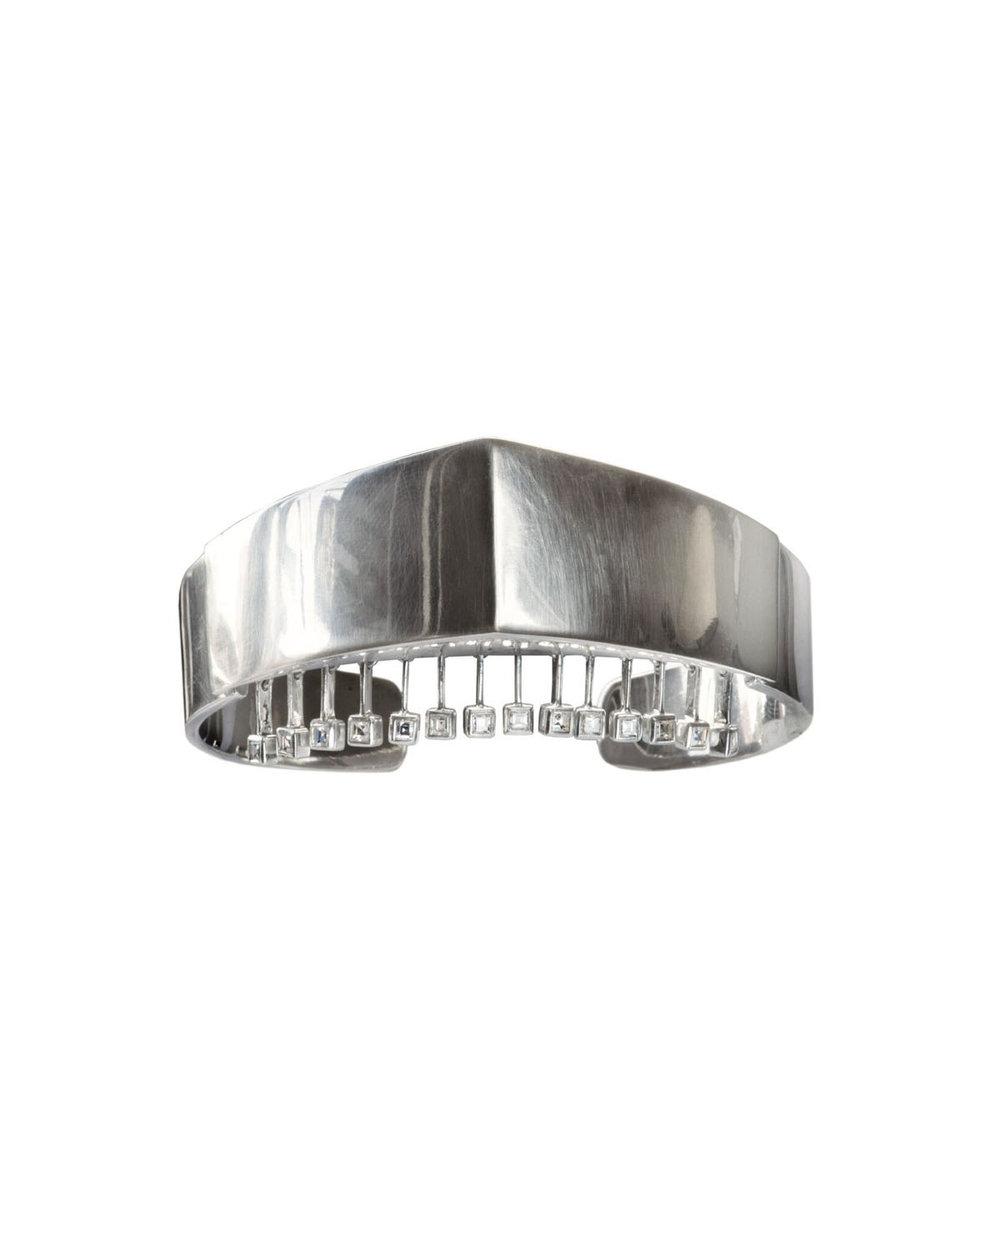 Erie Basin -  Silver Veil Bracelet